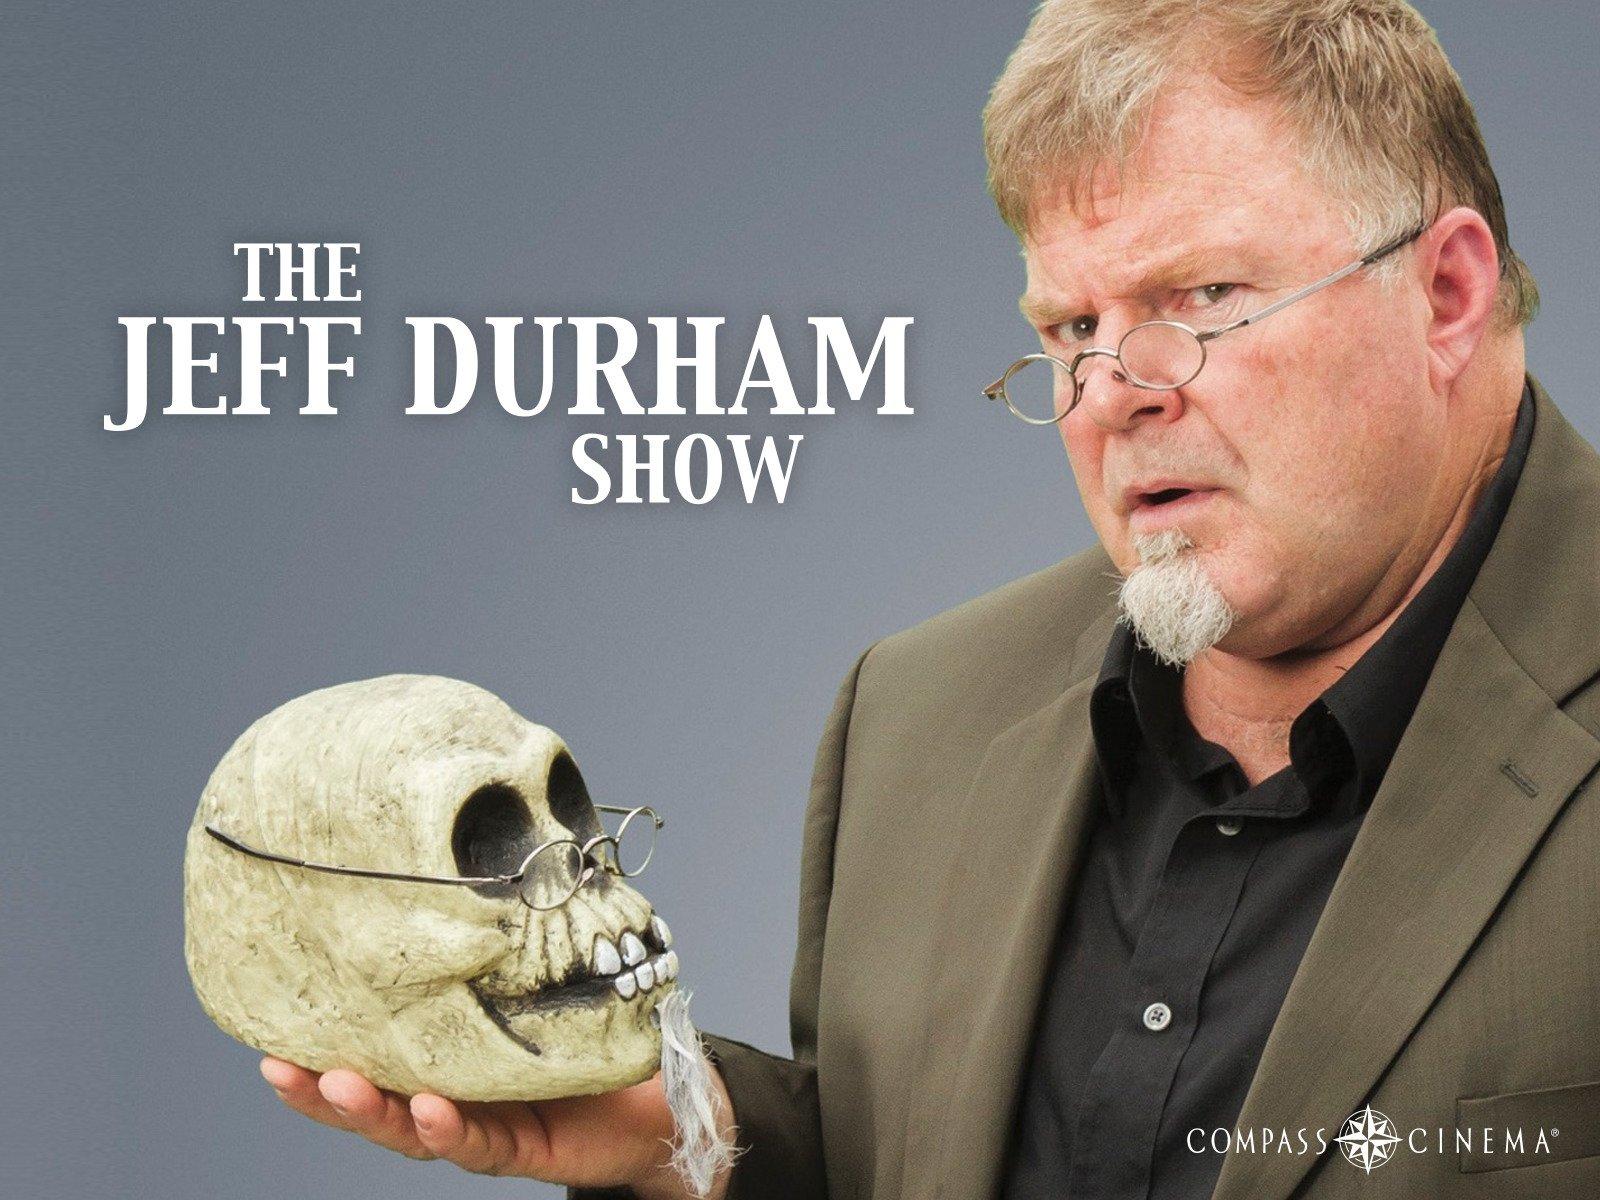 The Jeff Durham Show - Season 1